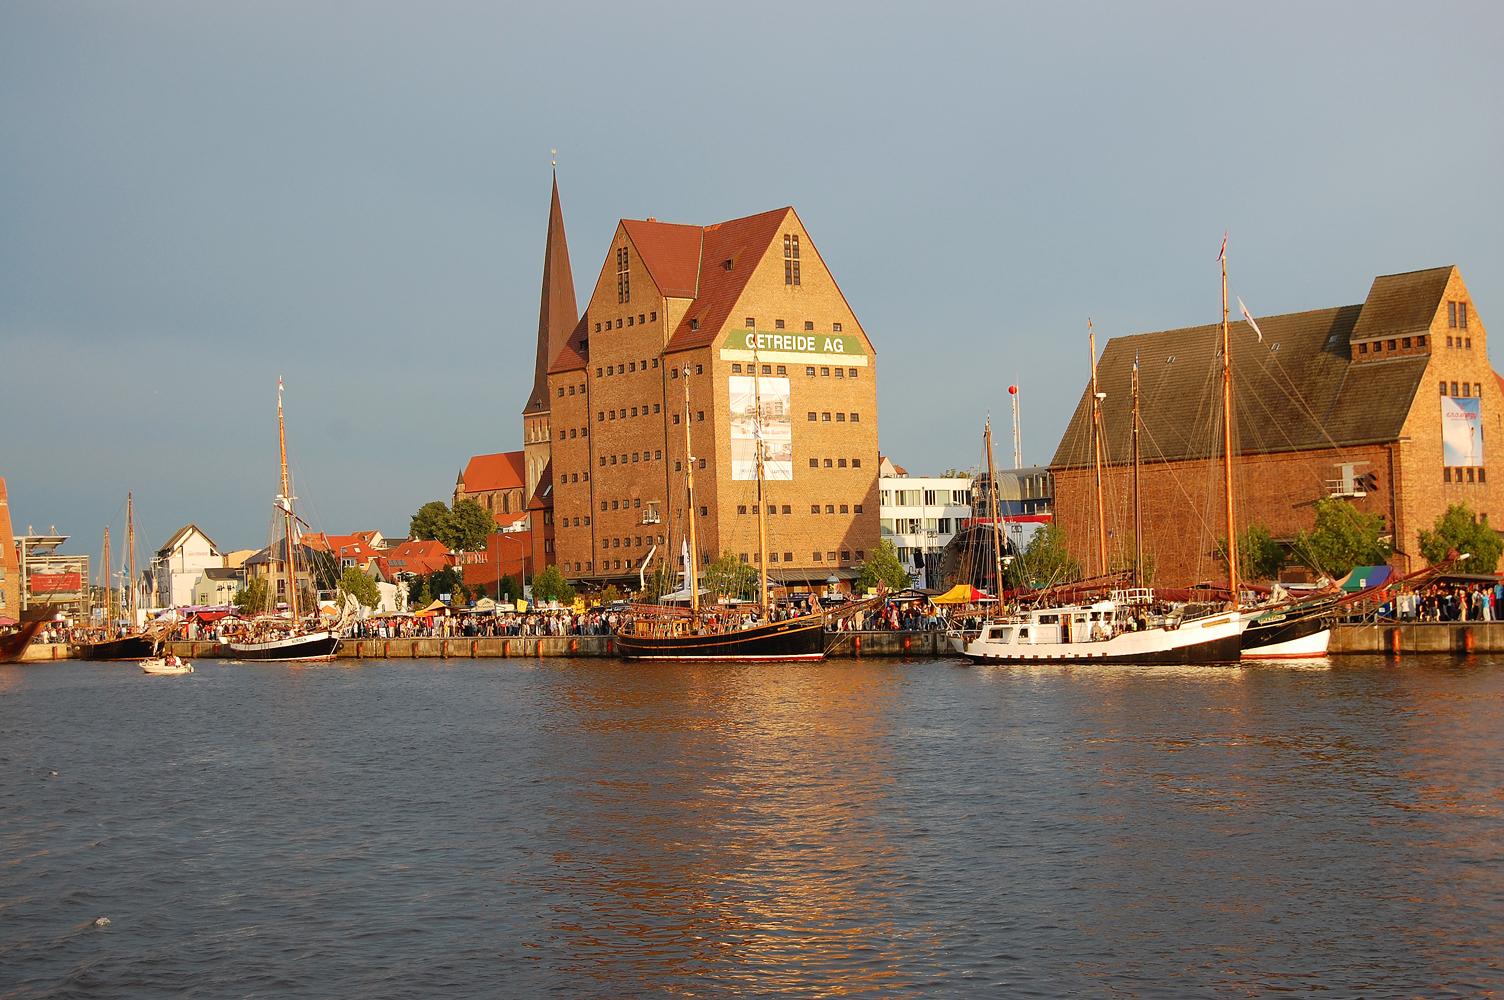 20. Rostocker Hanse Sail 1